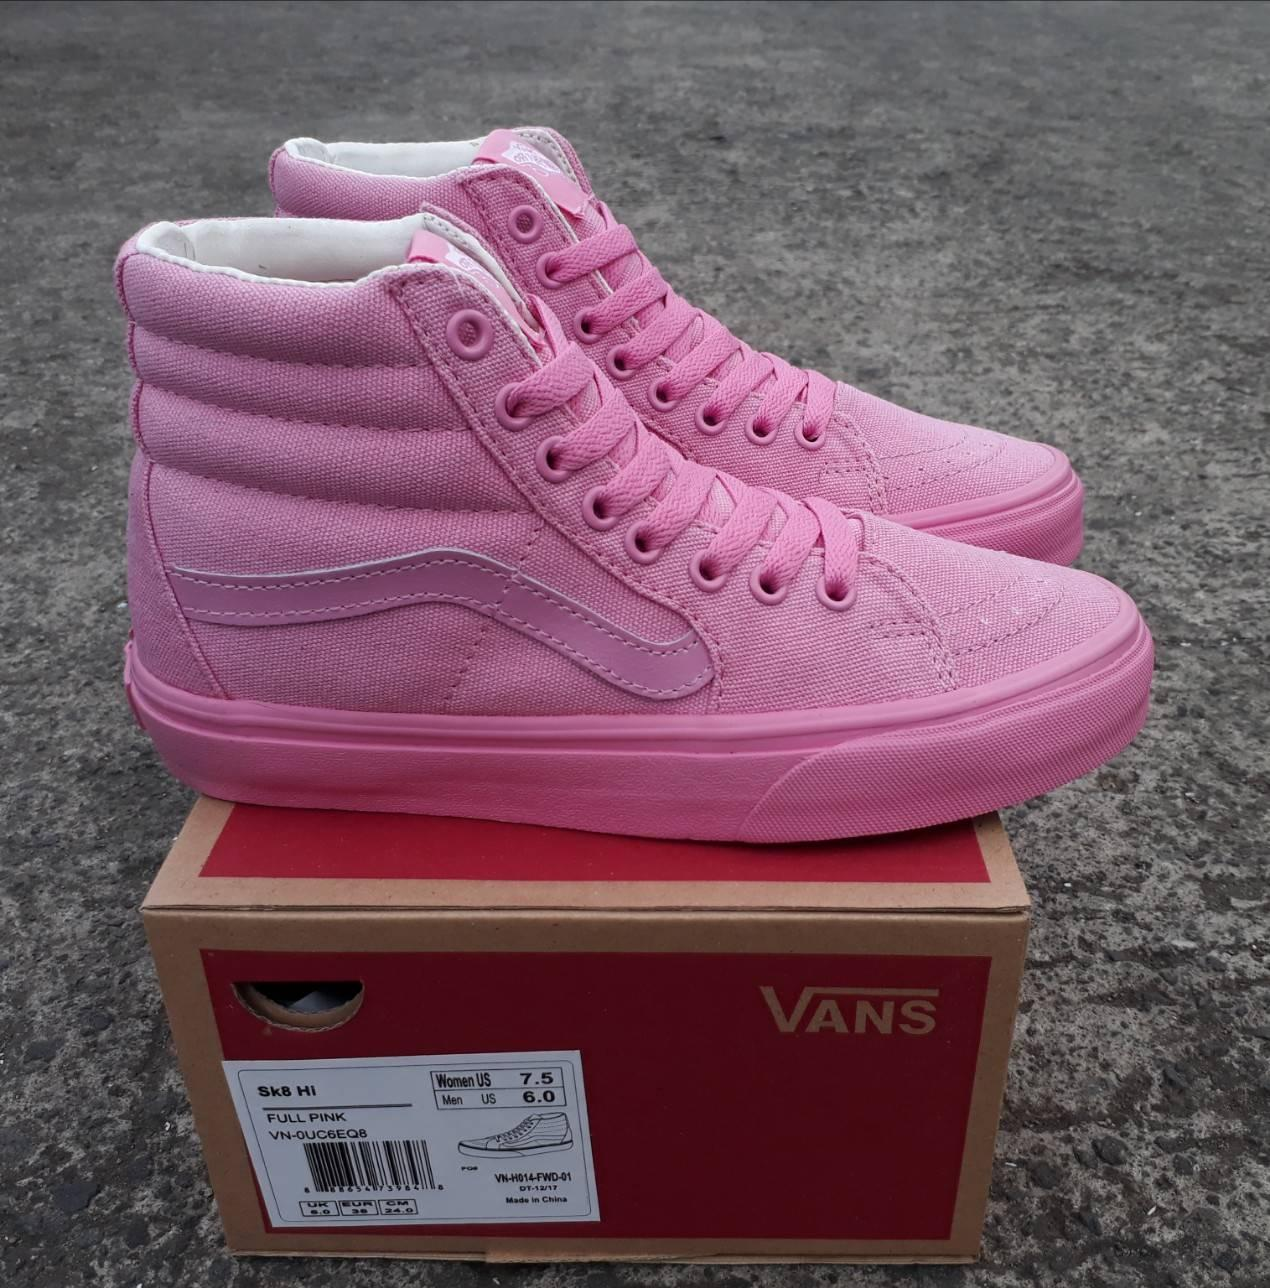 sepatu vans sk8 hi full pink wafle dt